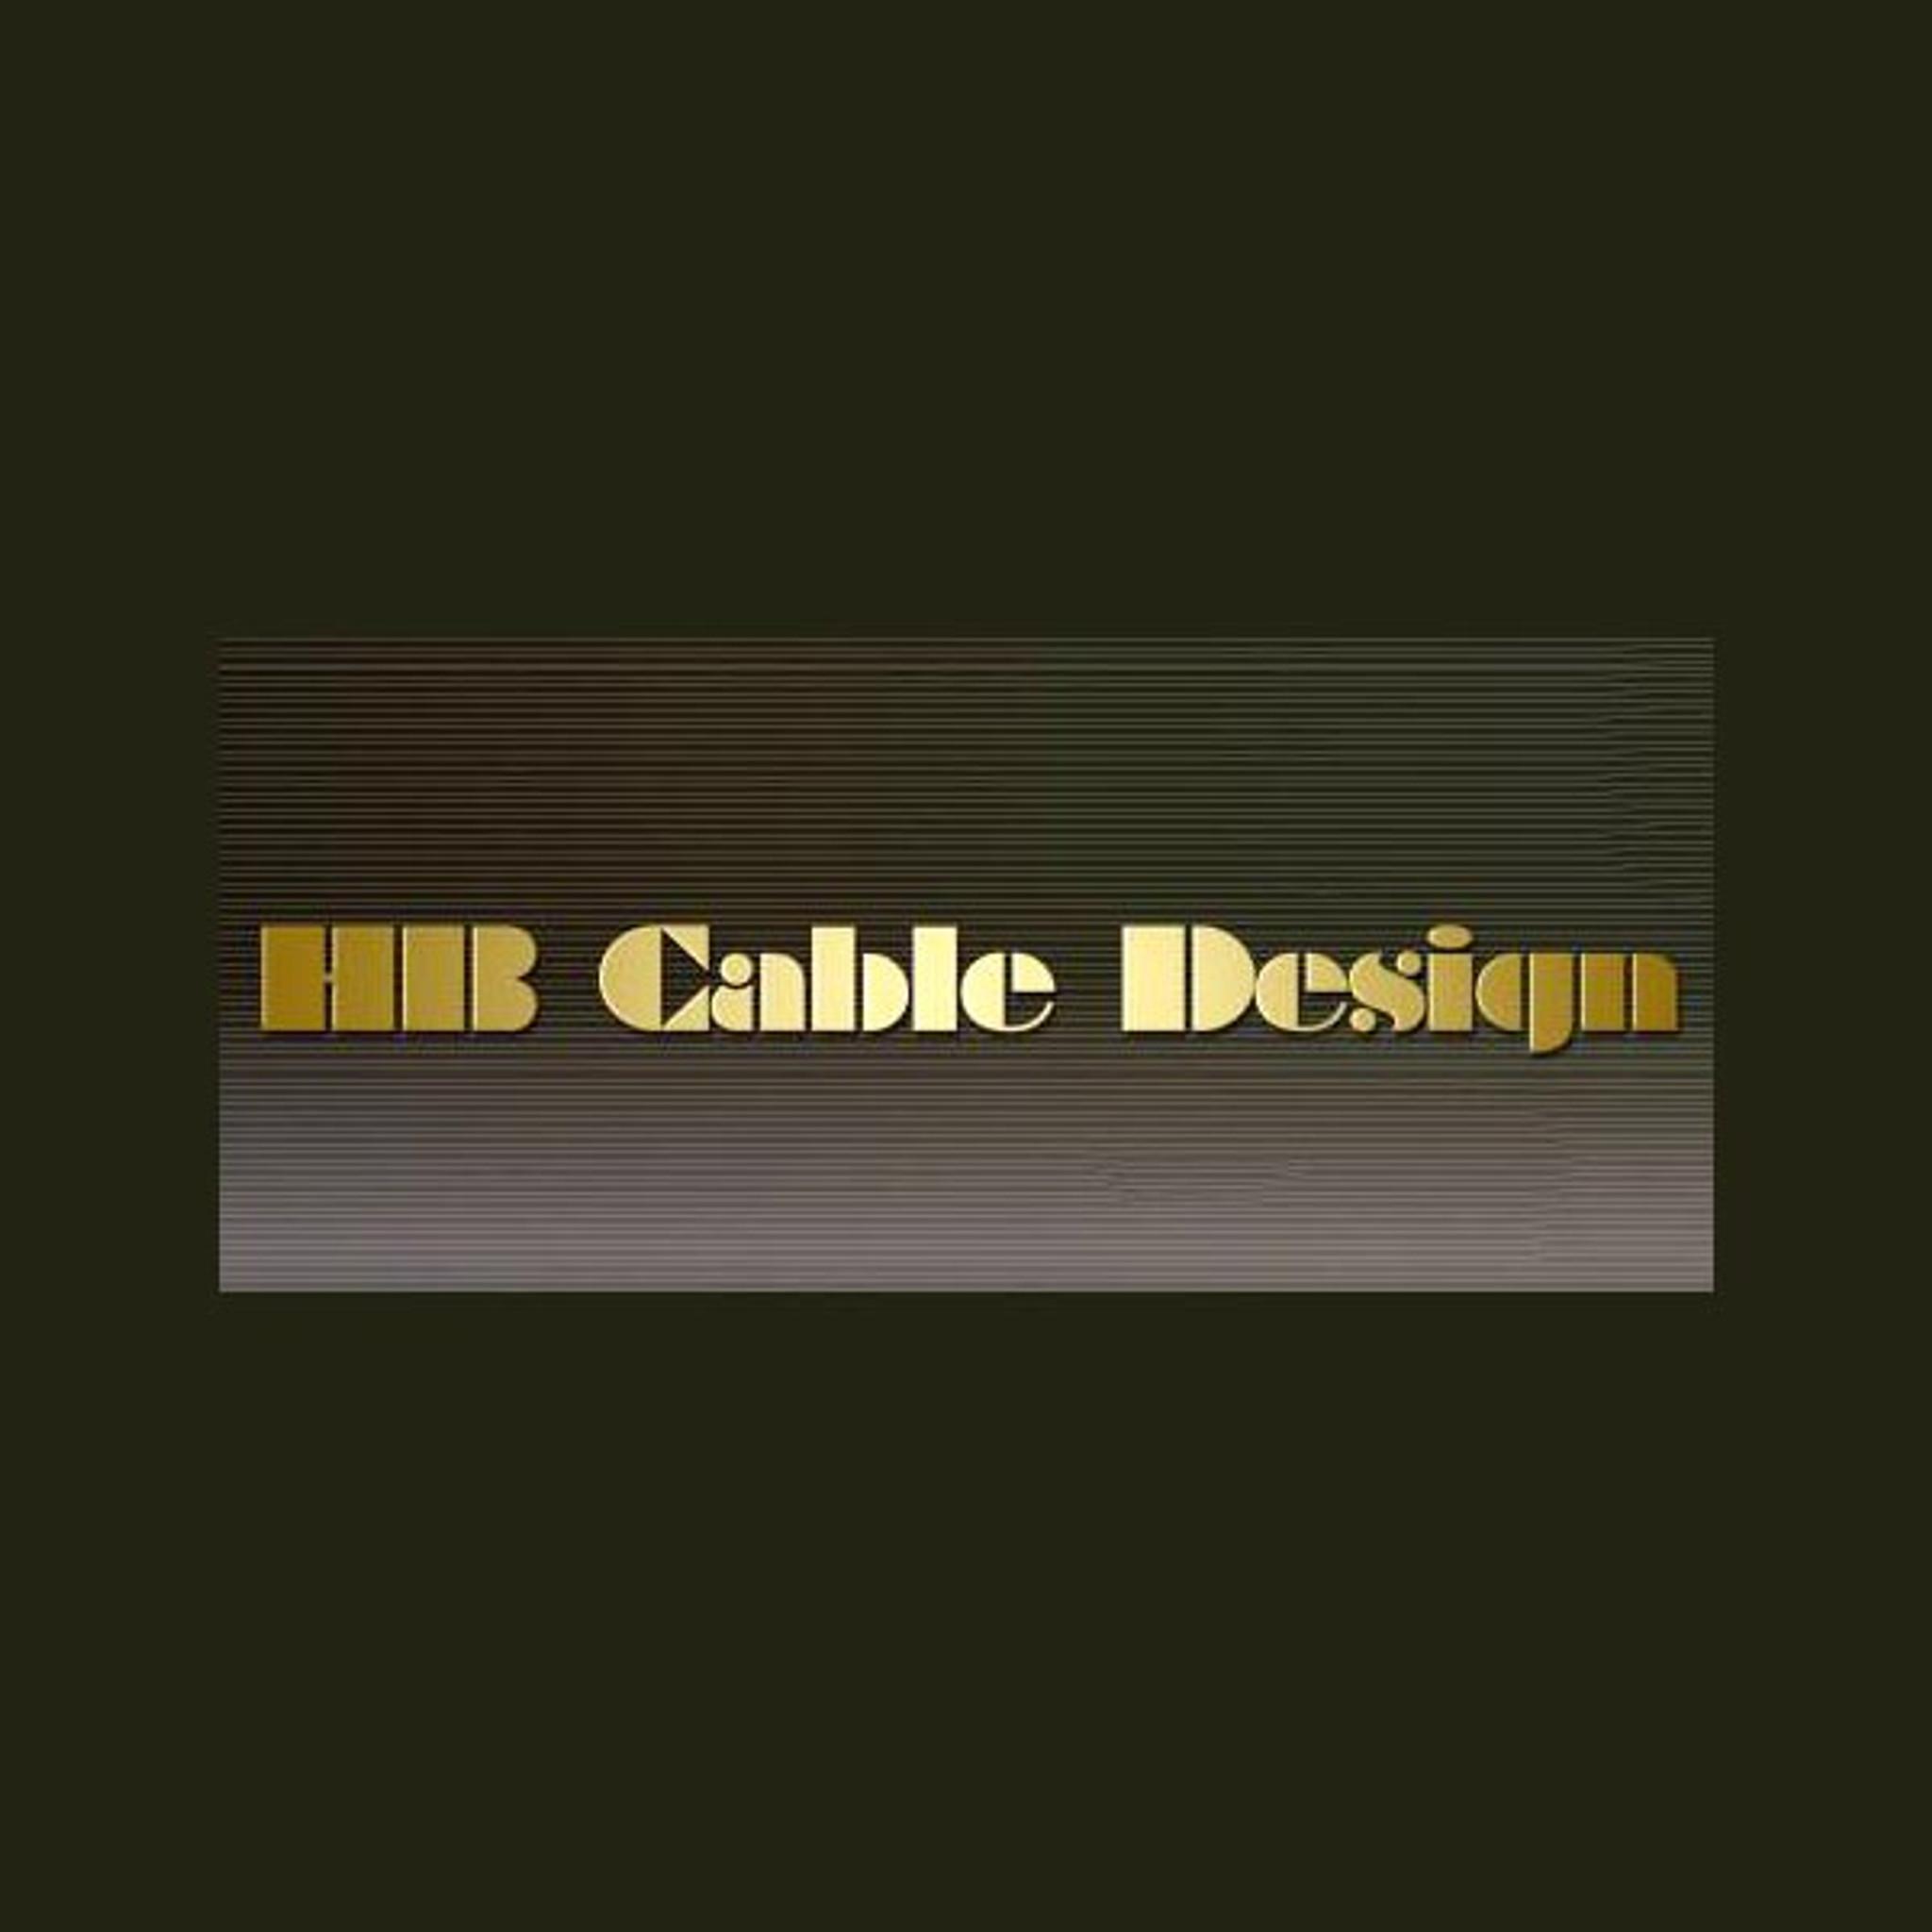 HB Cable Design